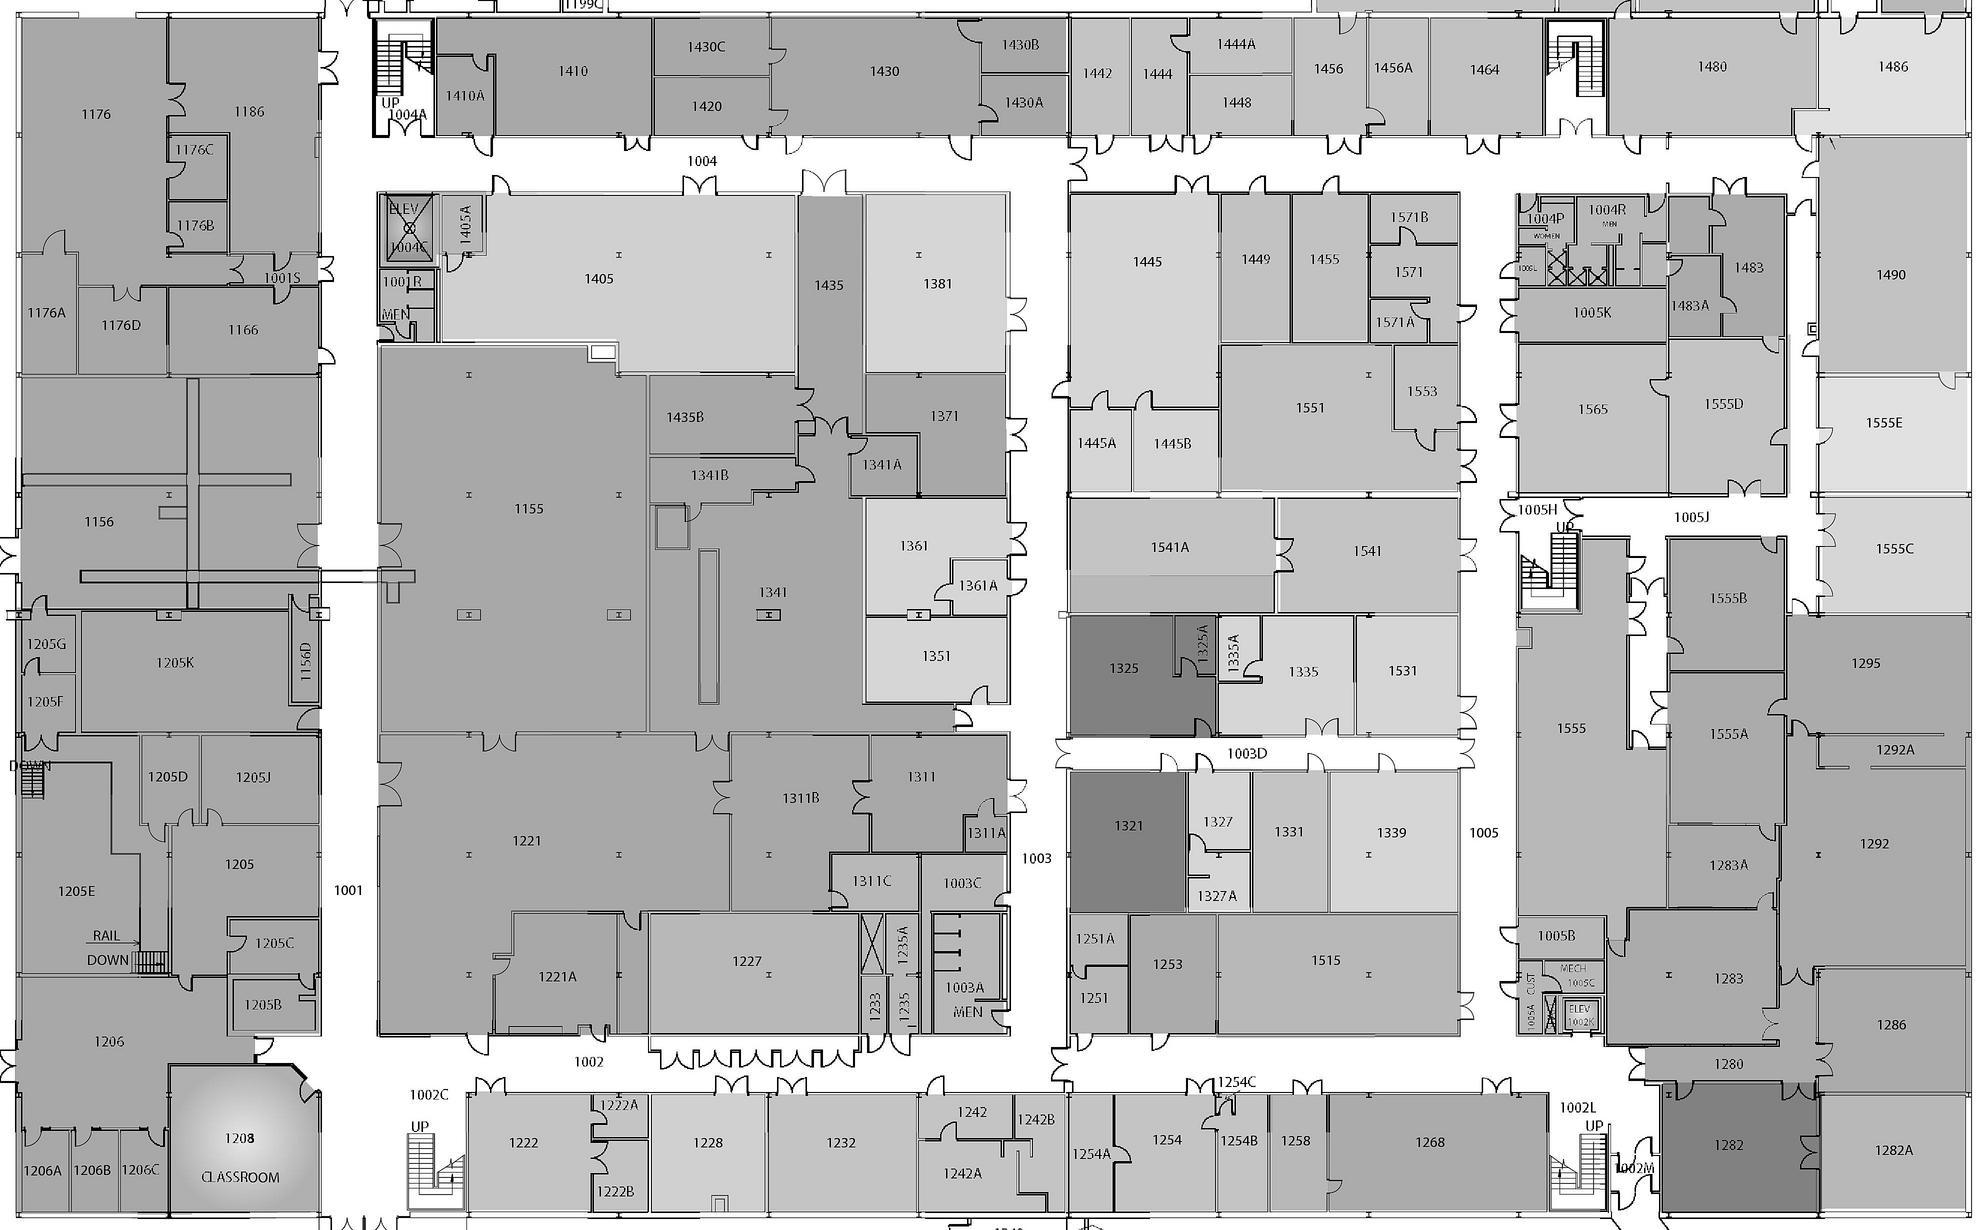 www/floormap/meb1fl-4.jpg